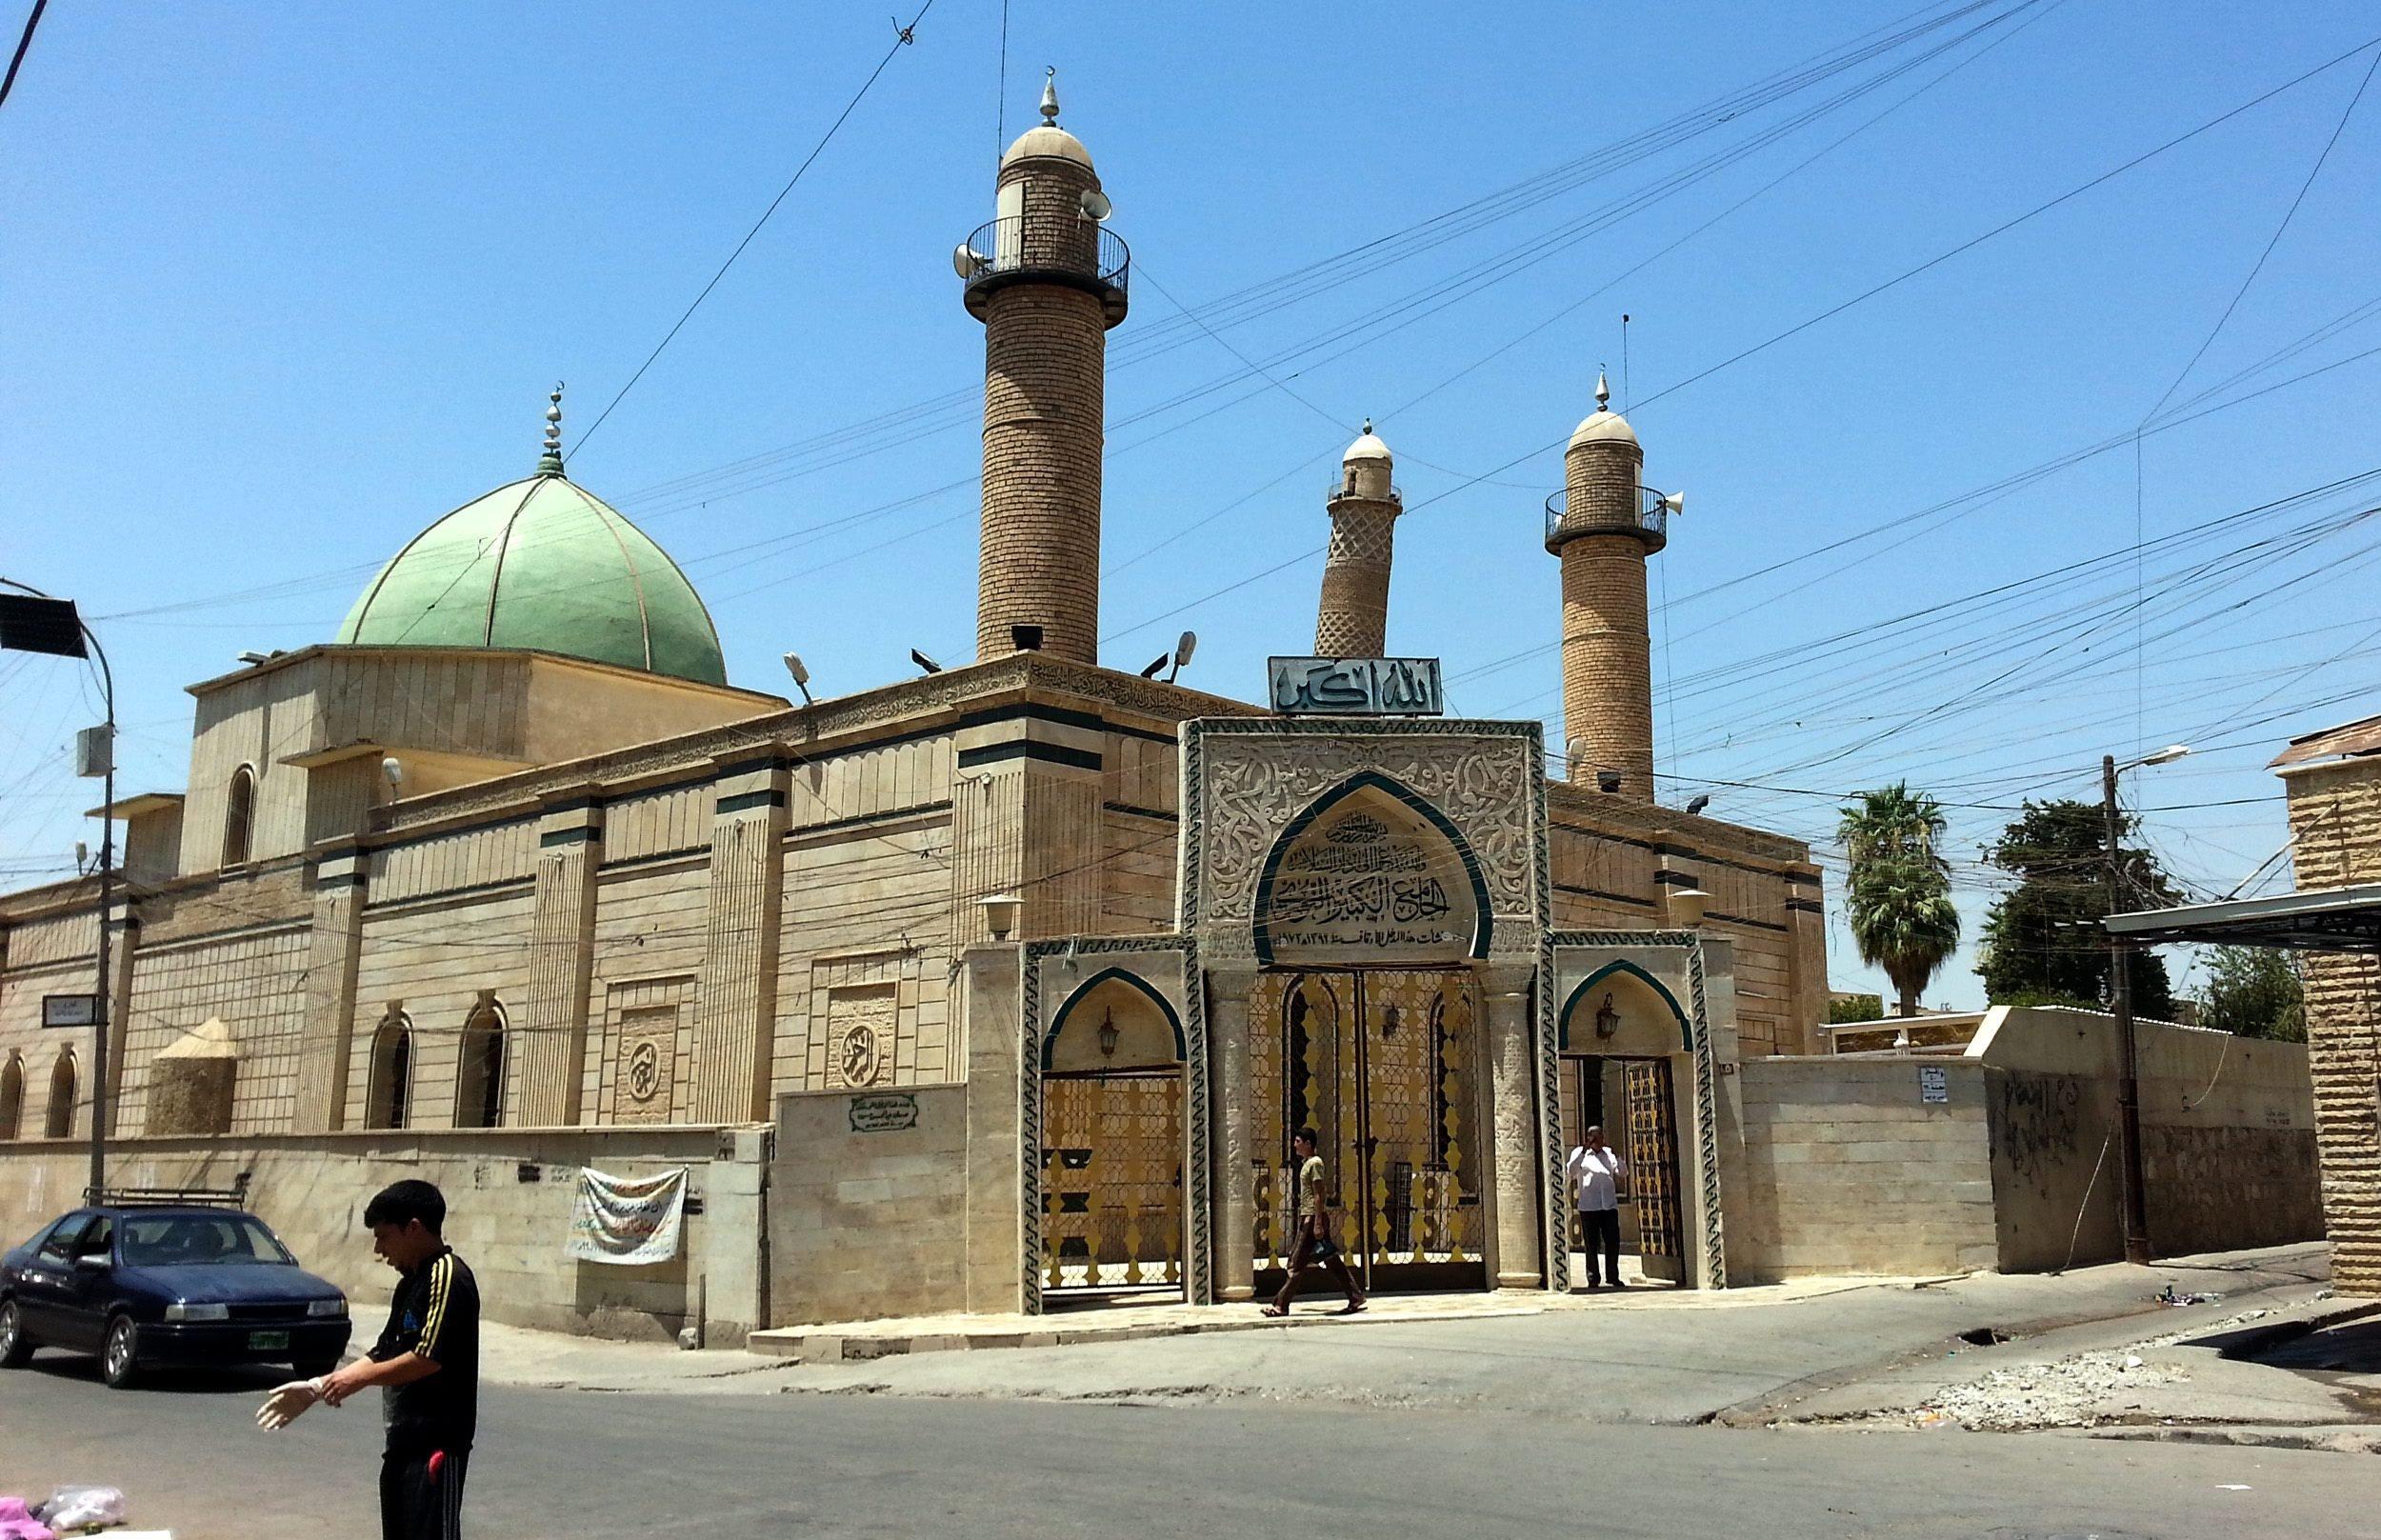 Iraqis walk next to the Al-Noori Al-Kabeer mosque in Mosul city, northern Iraq on July 9, 2014.